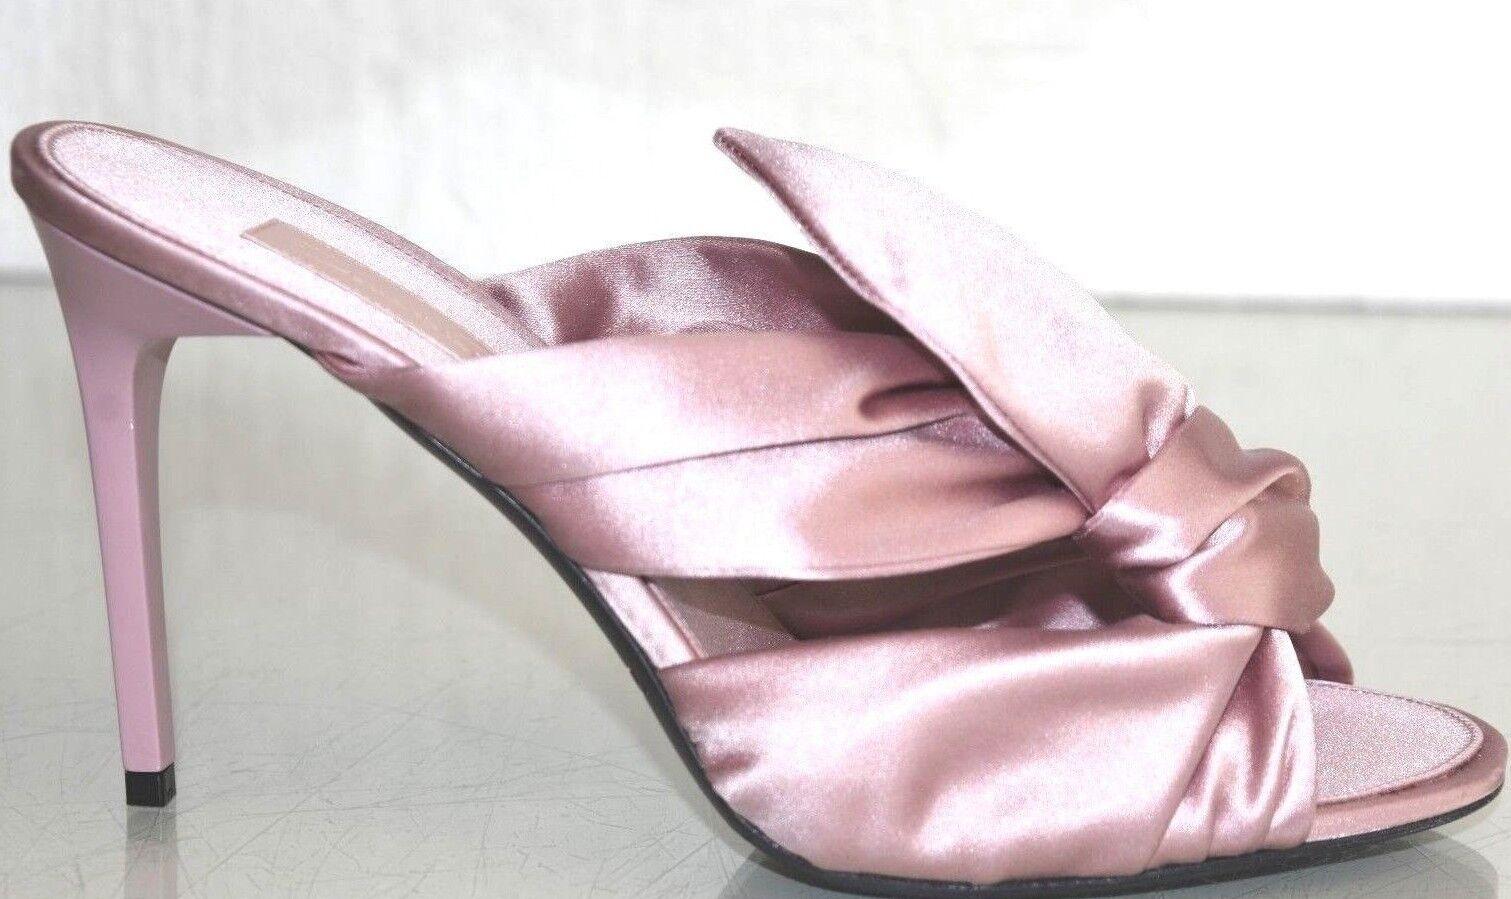 690 NEW Oscar de la Renta PEIGE MULES Satin Heels Mauve Pink Slides shoes 40